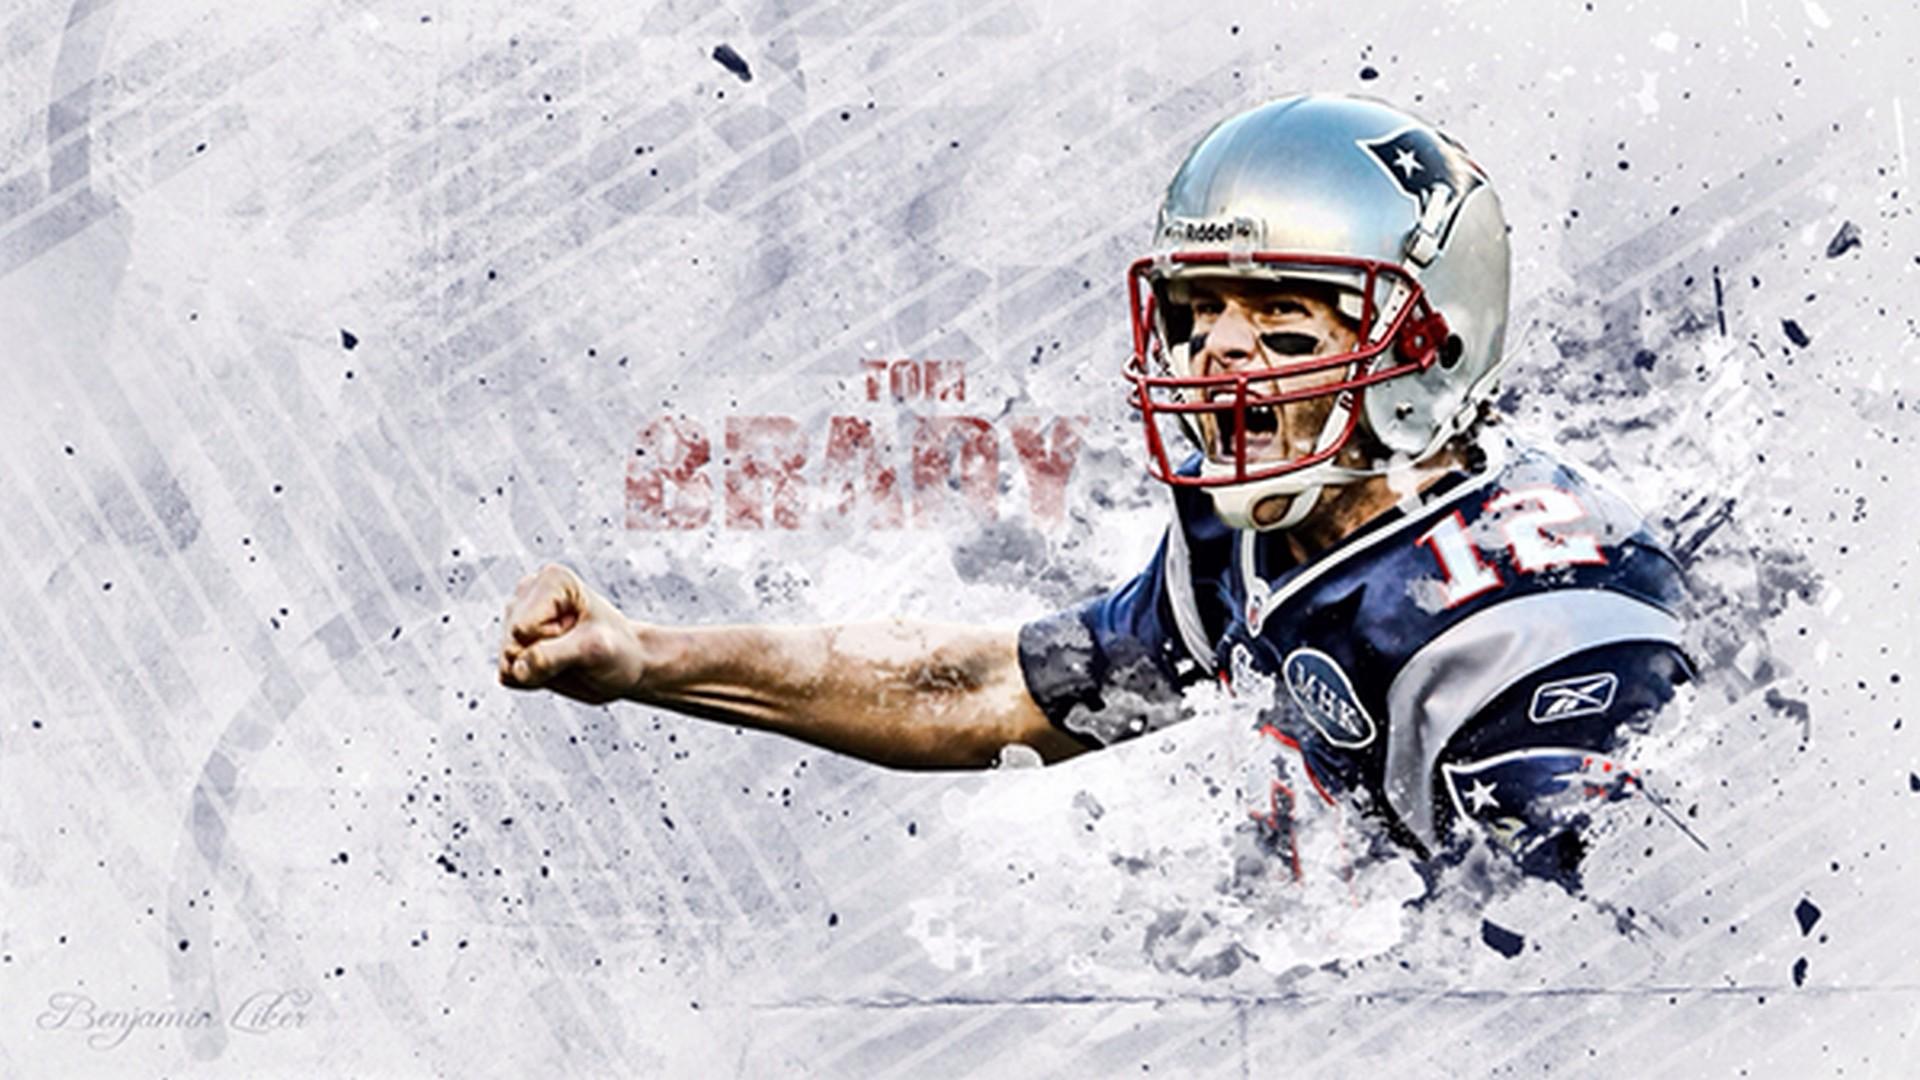 Patriots Iphone Wallpaper Wallpaper Hd Tom Brady Goat 2018 Wallpapers Hd